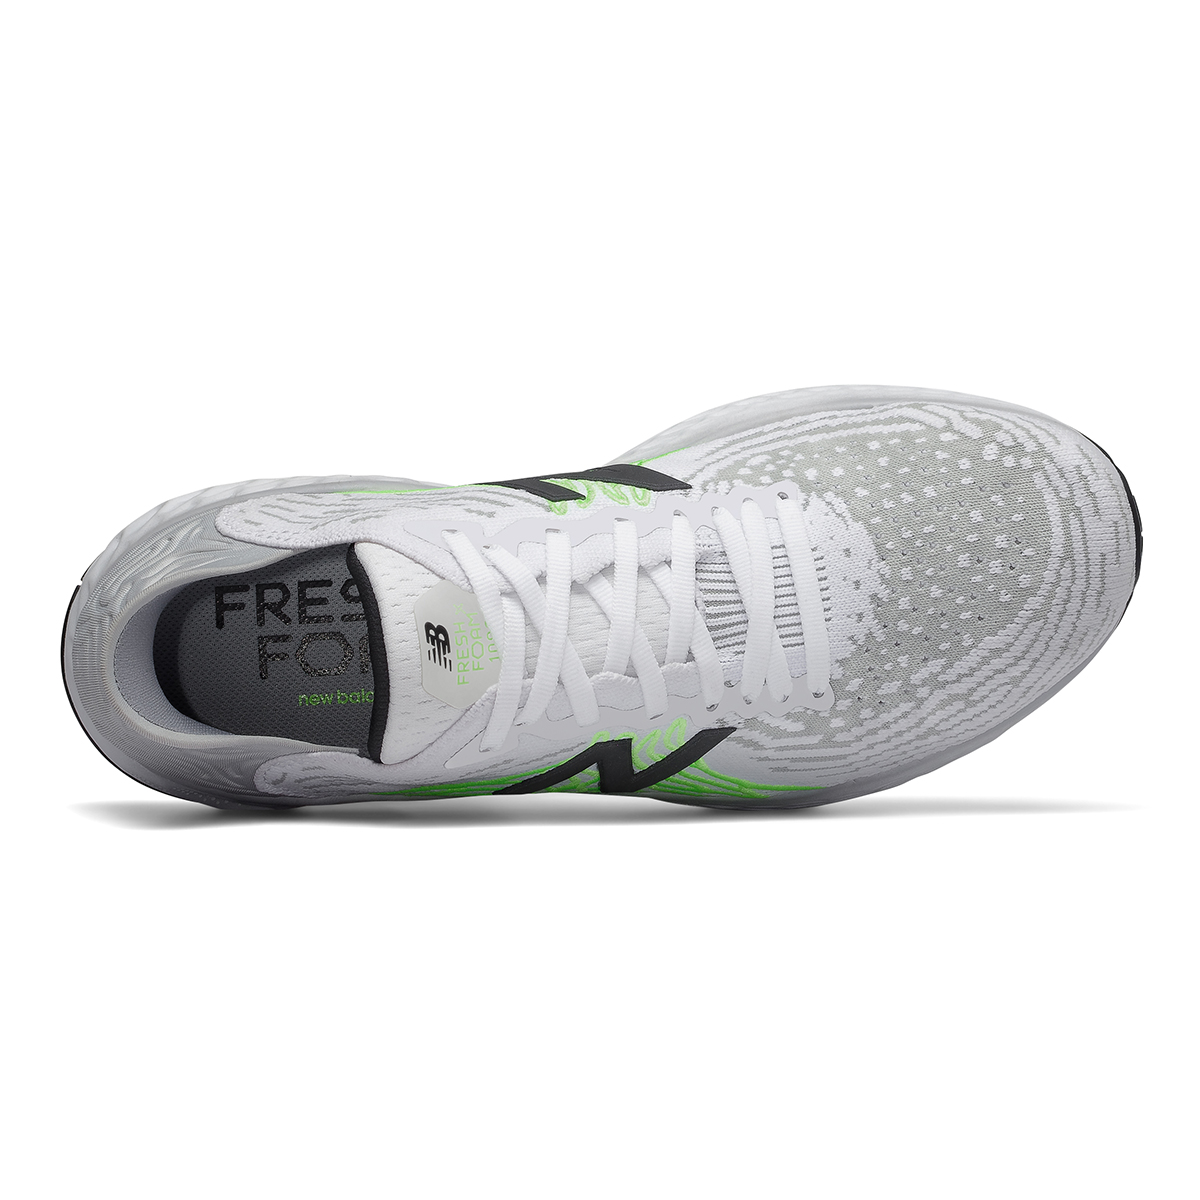 Men's New Balance Fresh Foam 1080v10 Running Shoe - Color: Light Aluminum - Size: 7 - Width: Wide, Light Aluminum, large, image 3